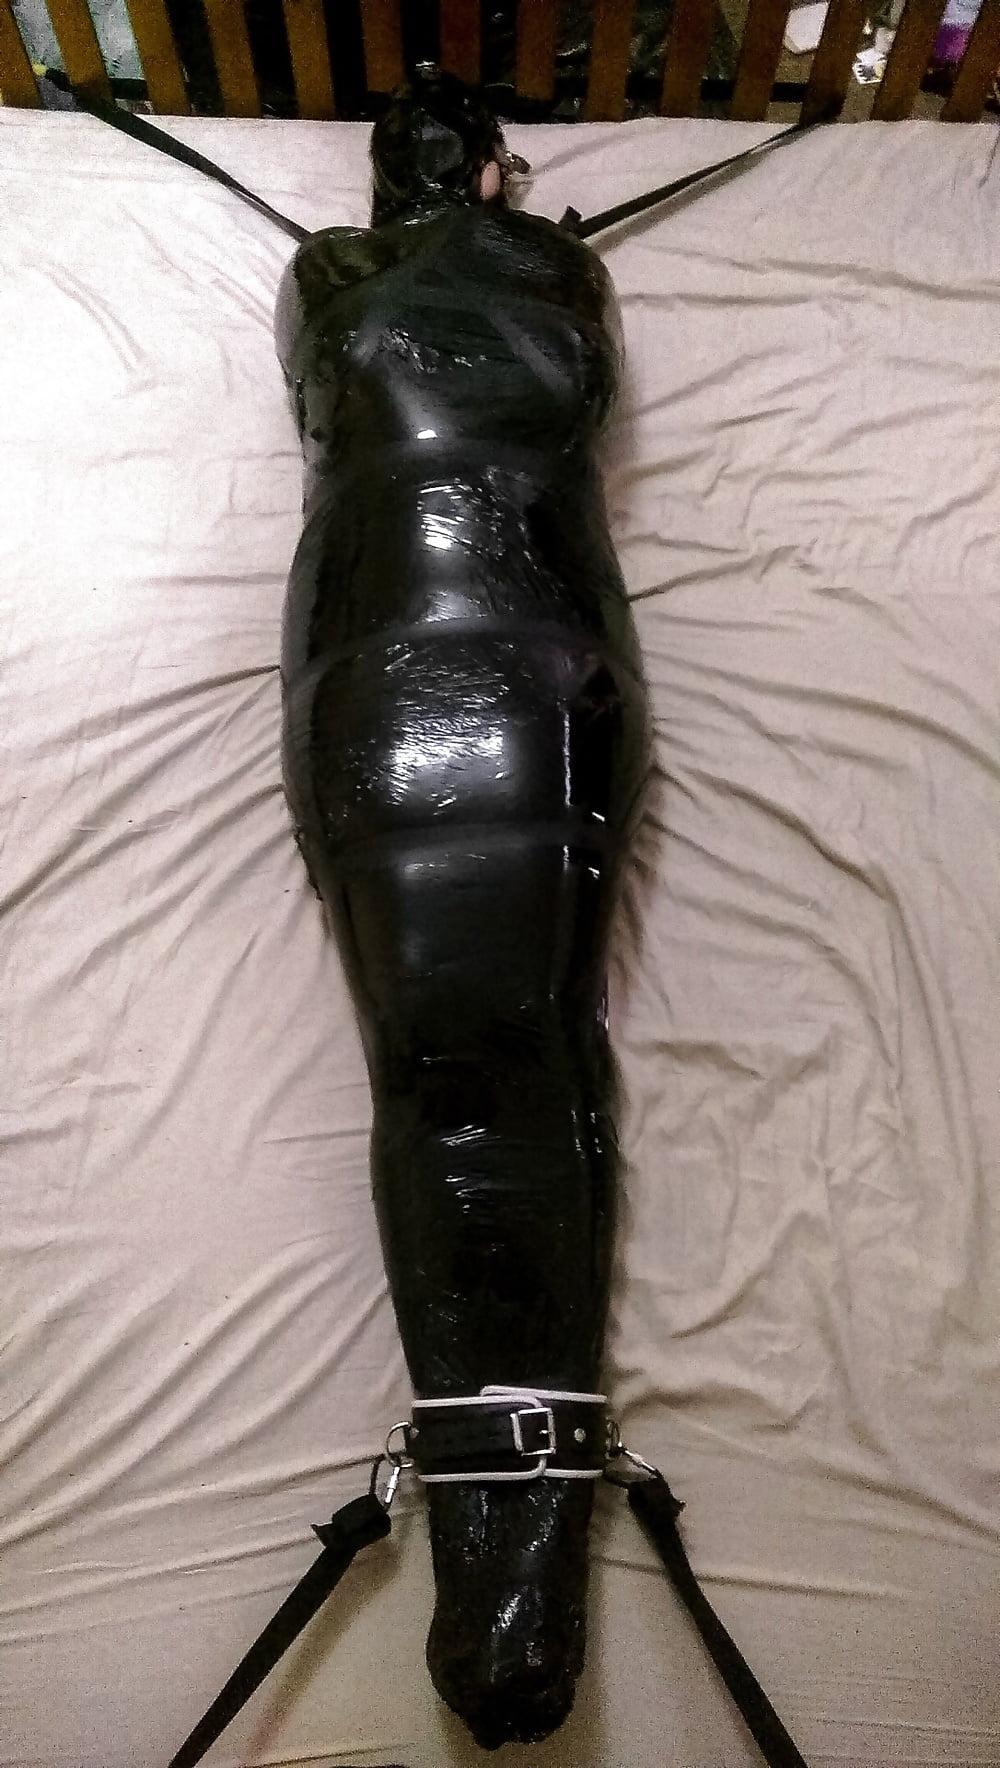 Porno mummified, mature nude men and women